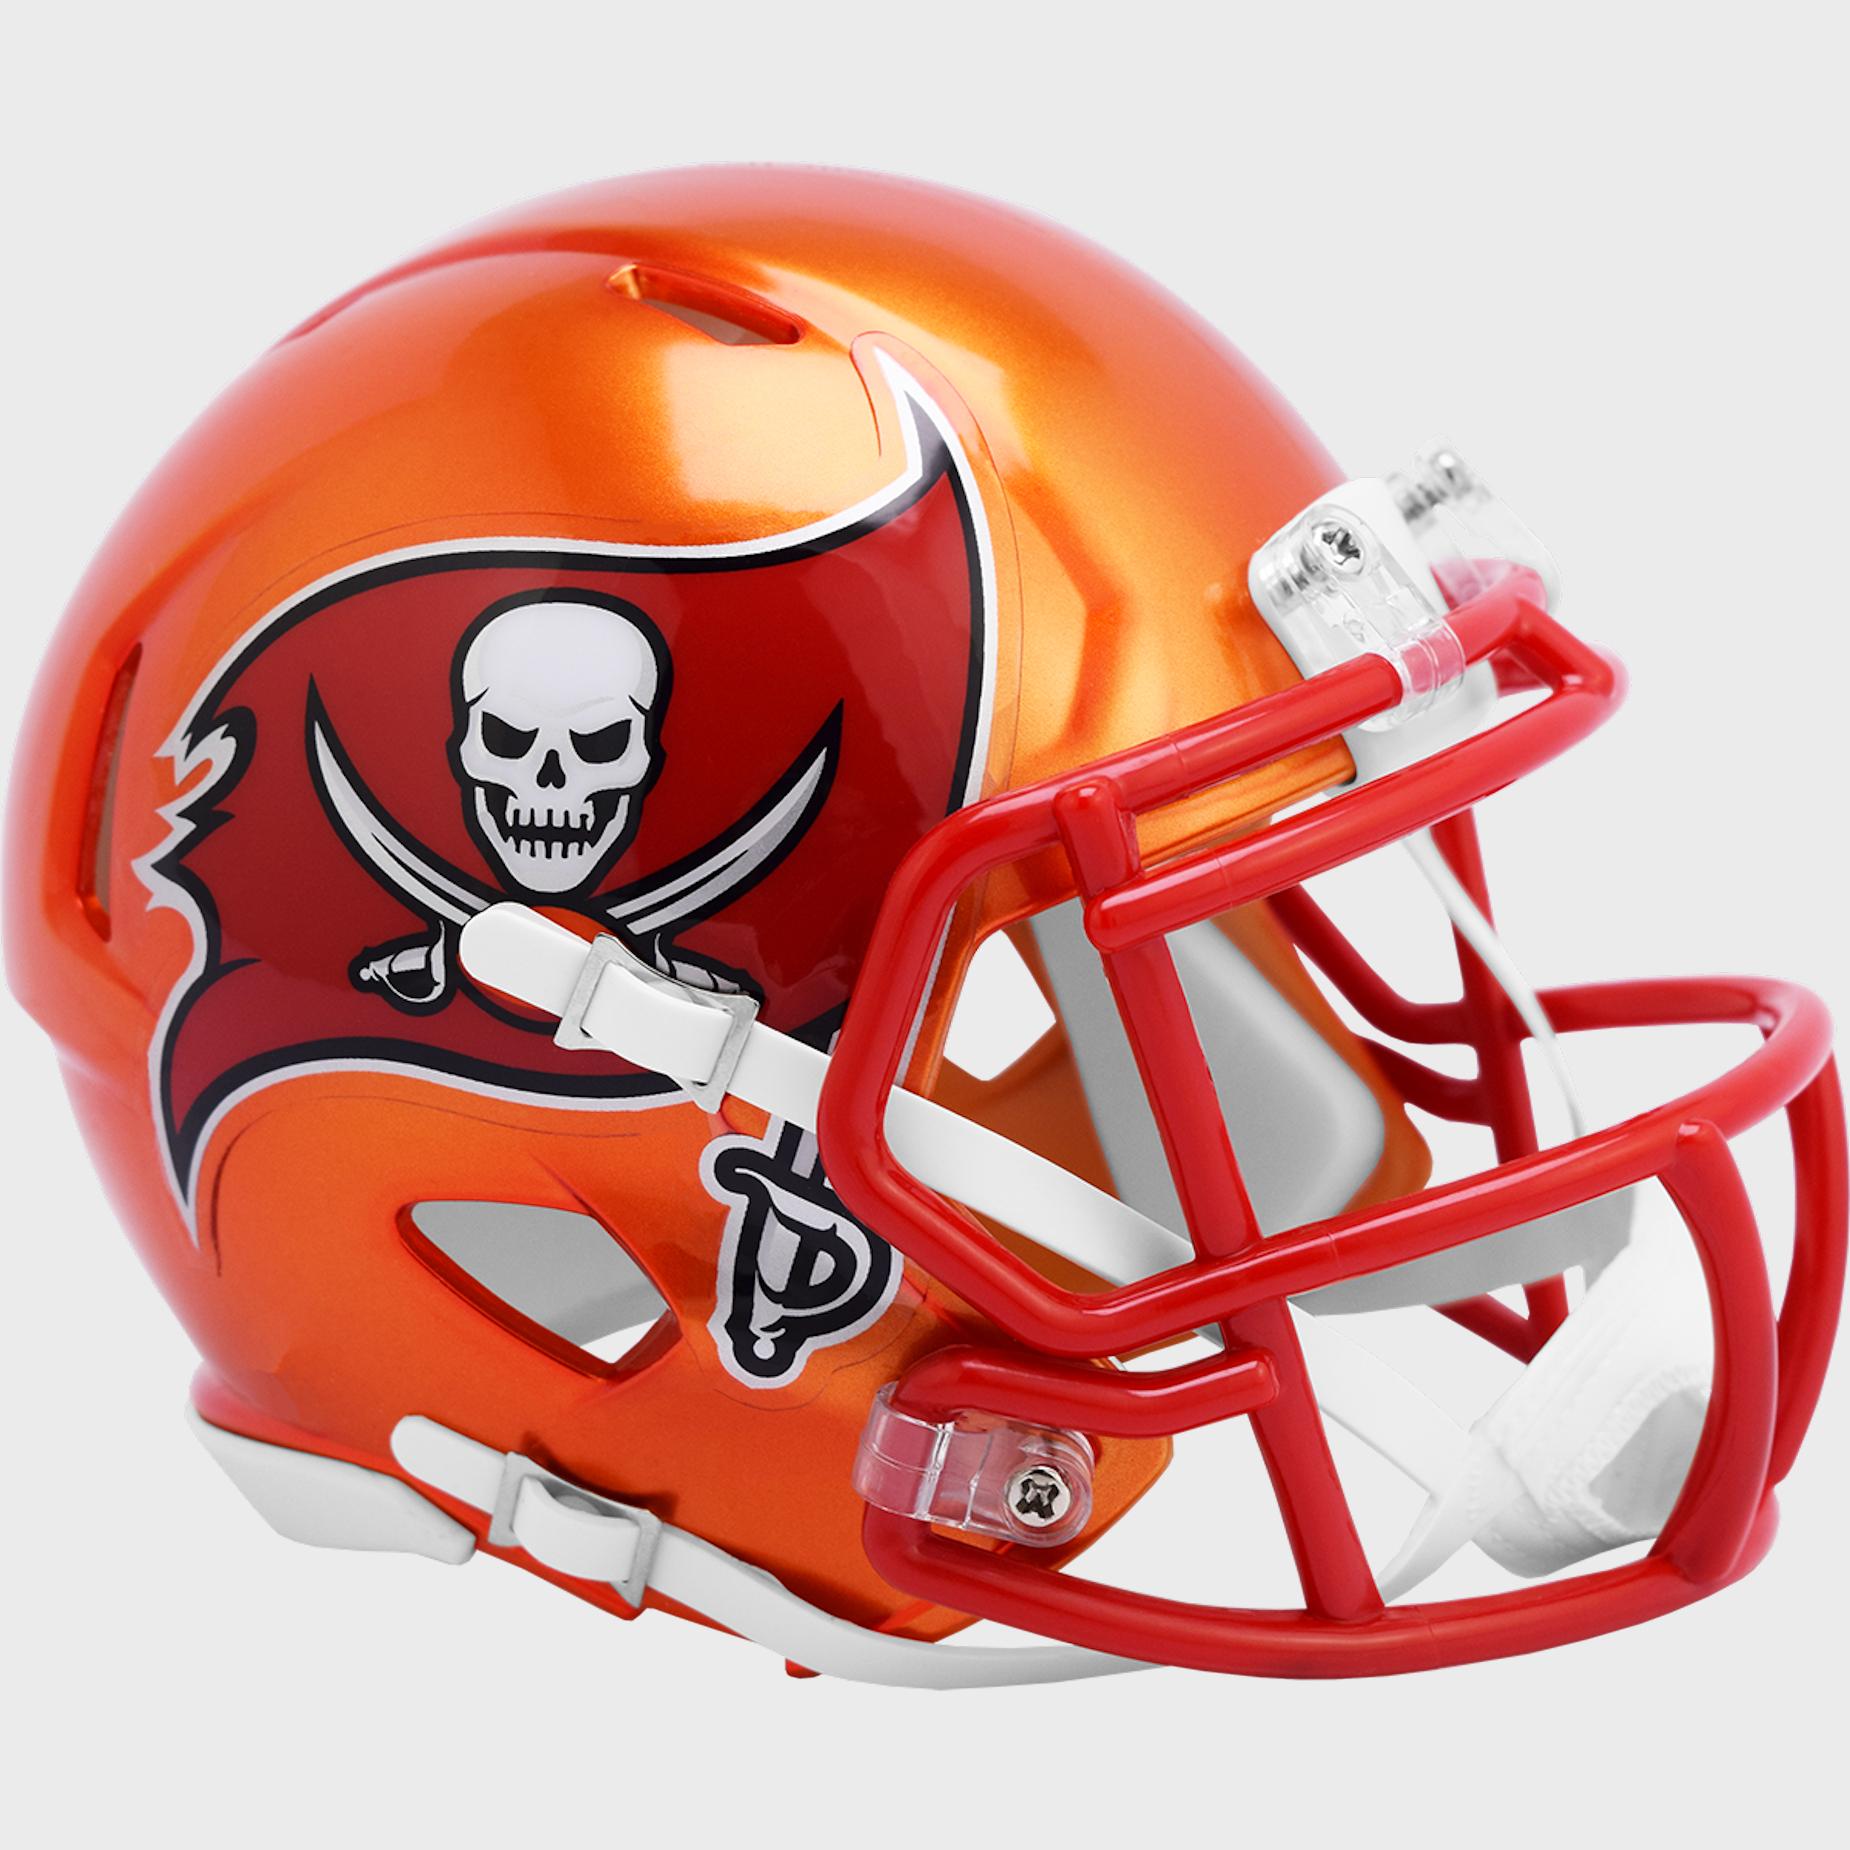 Tampa Bay Buccaneers Speed Mini Football Helmet <B>FLASH ESD 8/21/21</B>